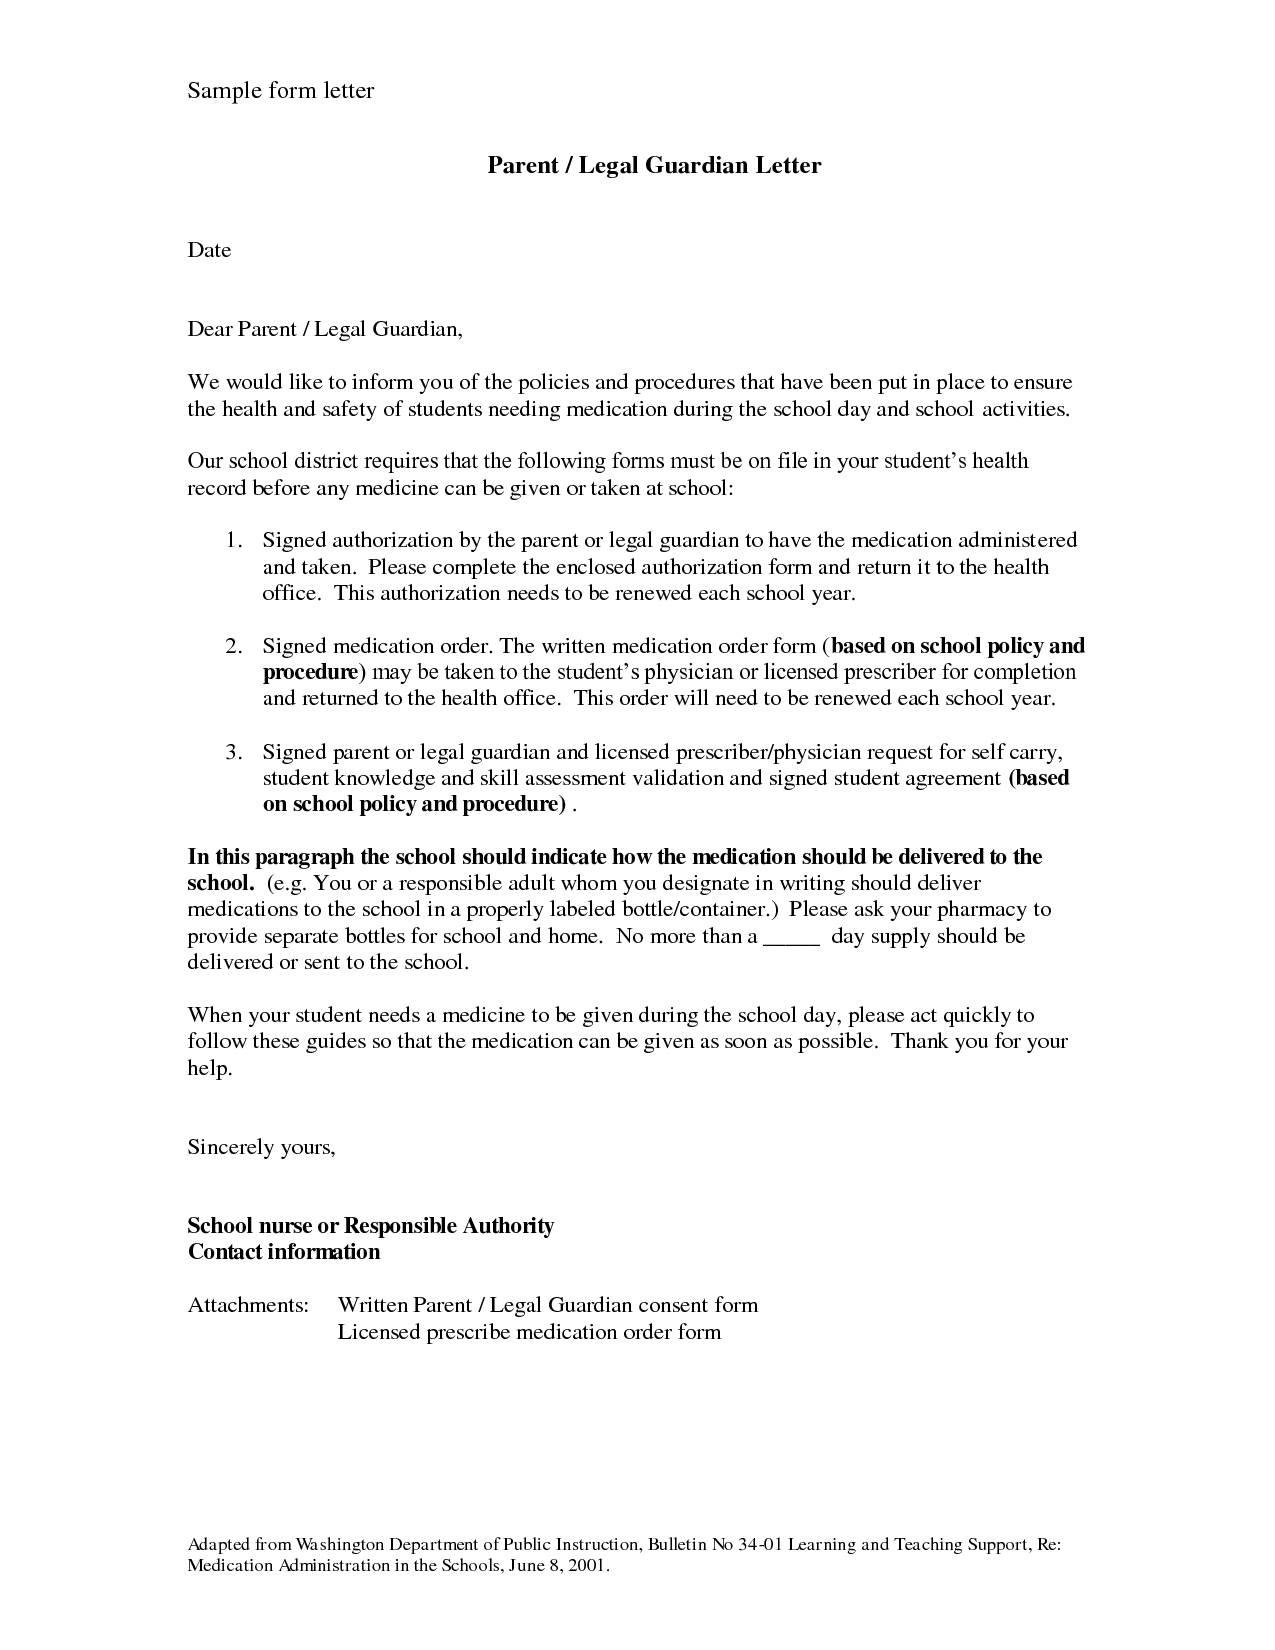 Temporary Guardianship Sample Letter